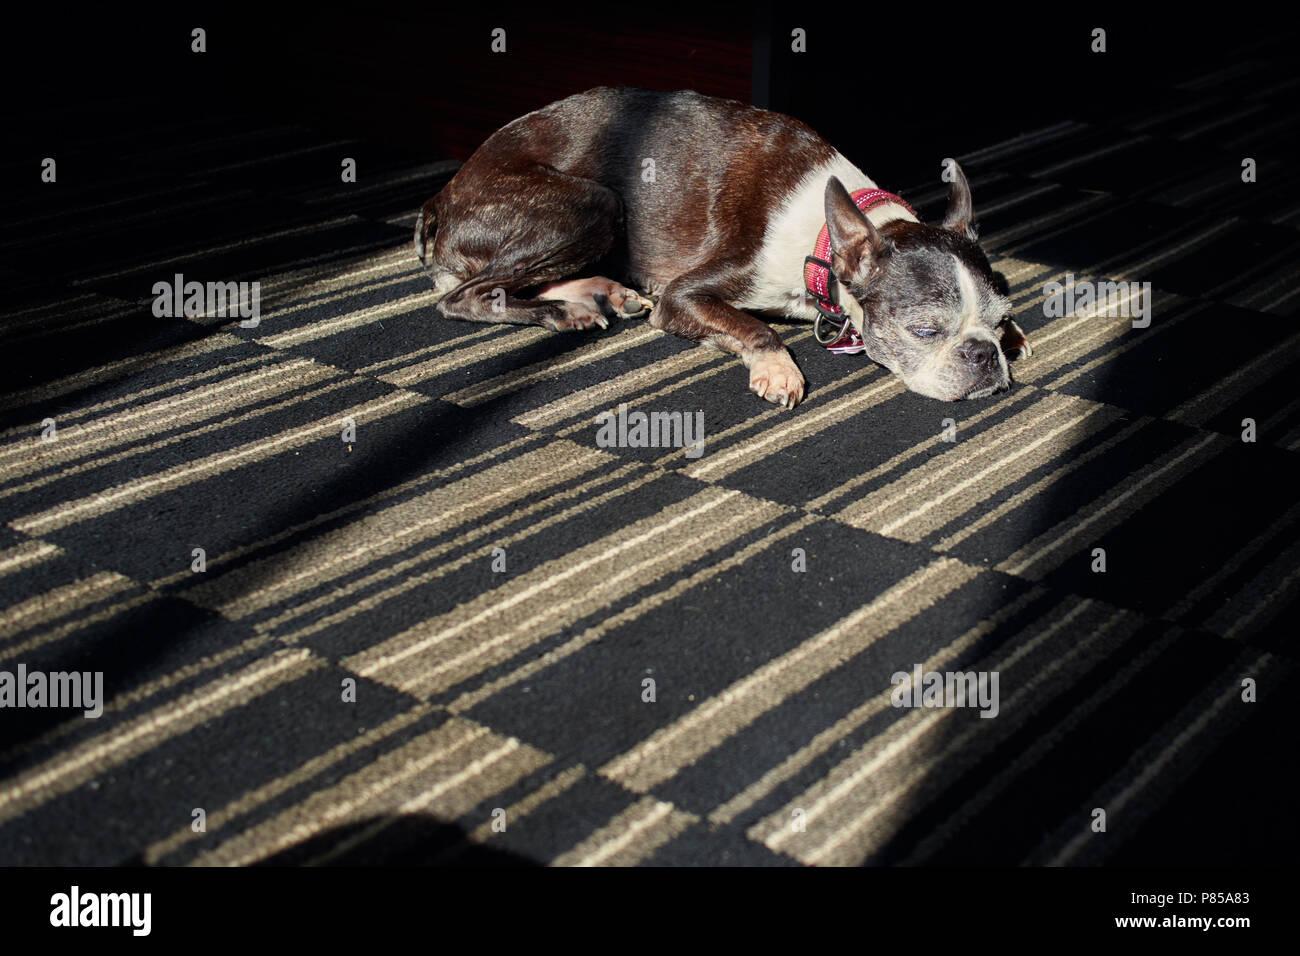 Elderly Boston Terrier dog sleeping in a sunbeam on carpet in a hotel room - Stock Image